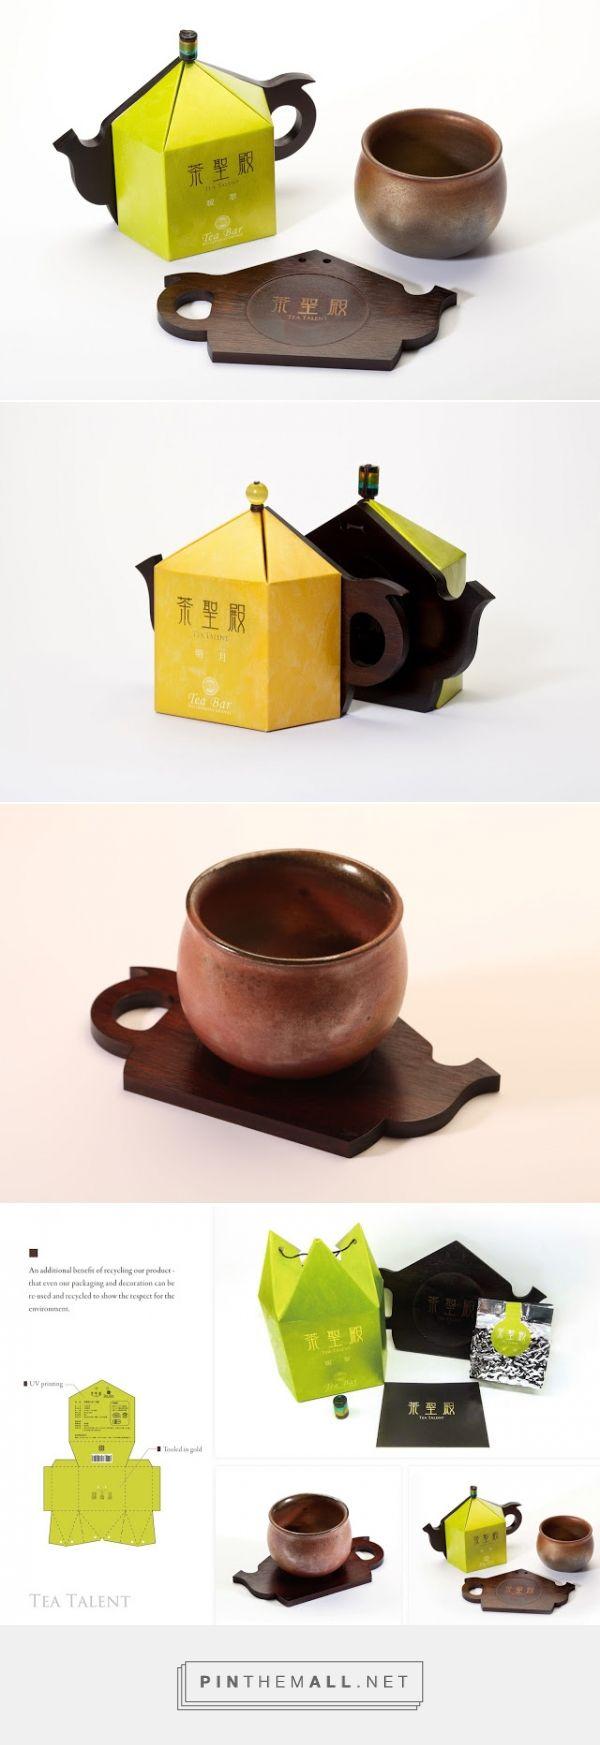 Tea Talent Packaging designed by Midea Creative Strategy (Taiwan) - http://www.packagingoftheworld.com/2016/01/tea-talent.html